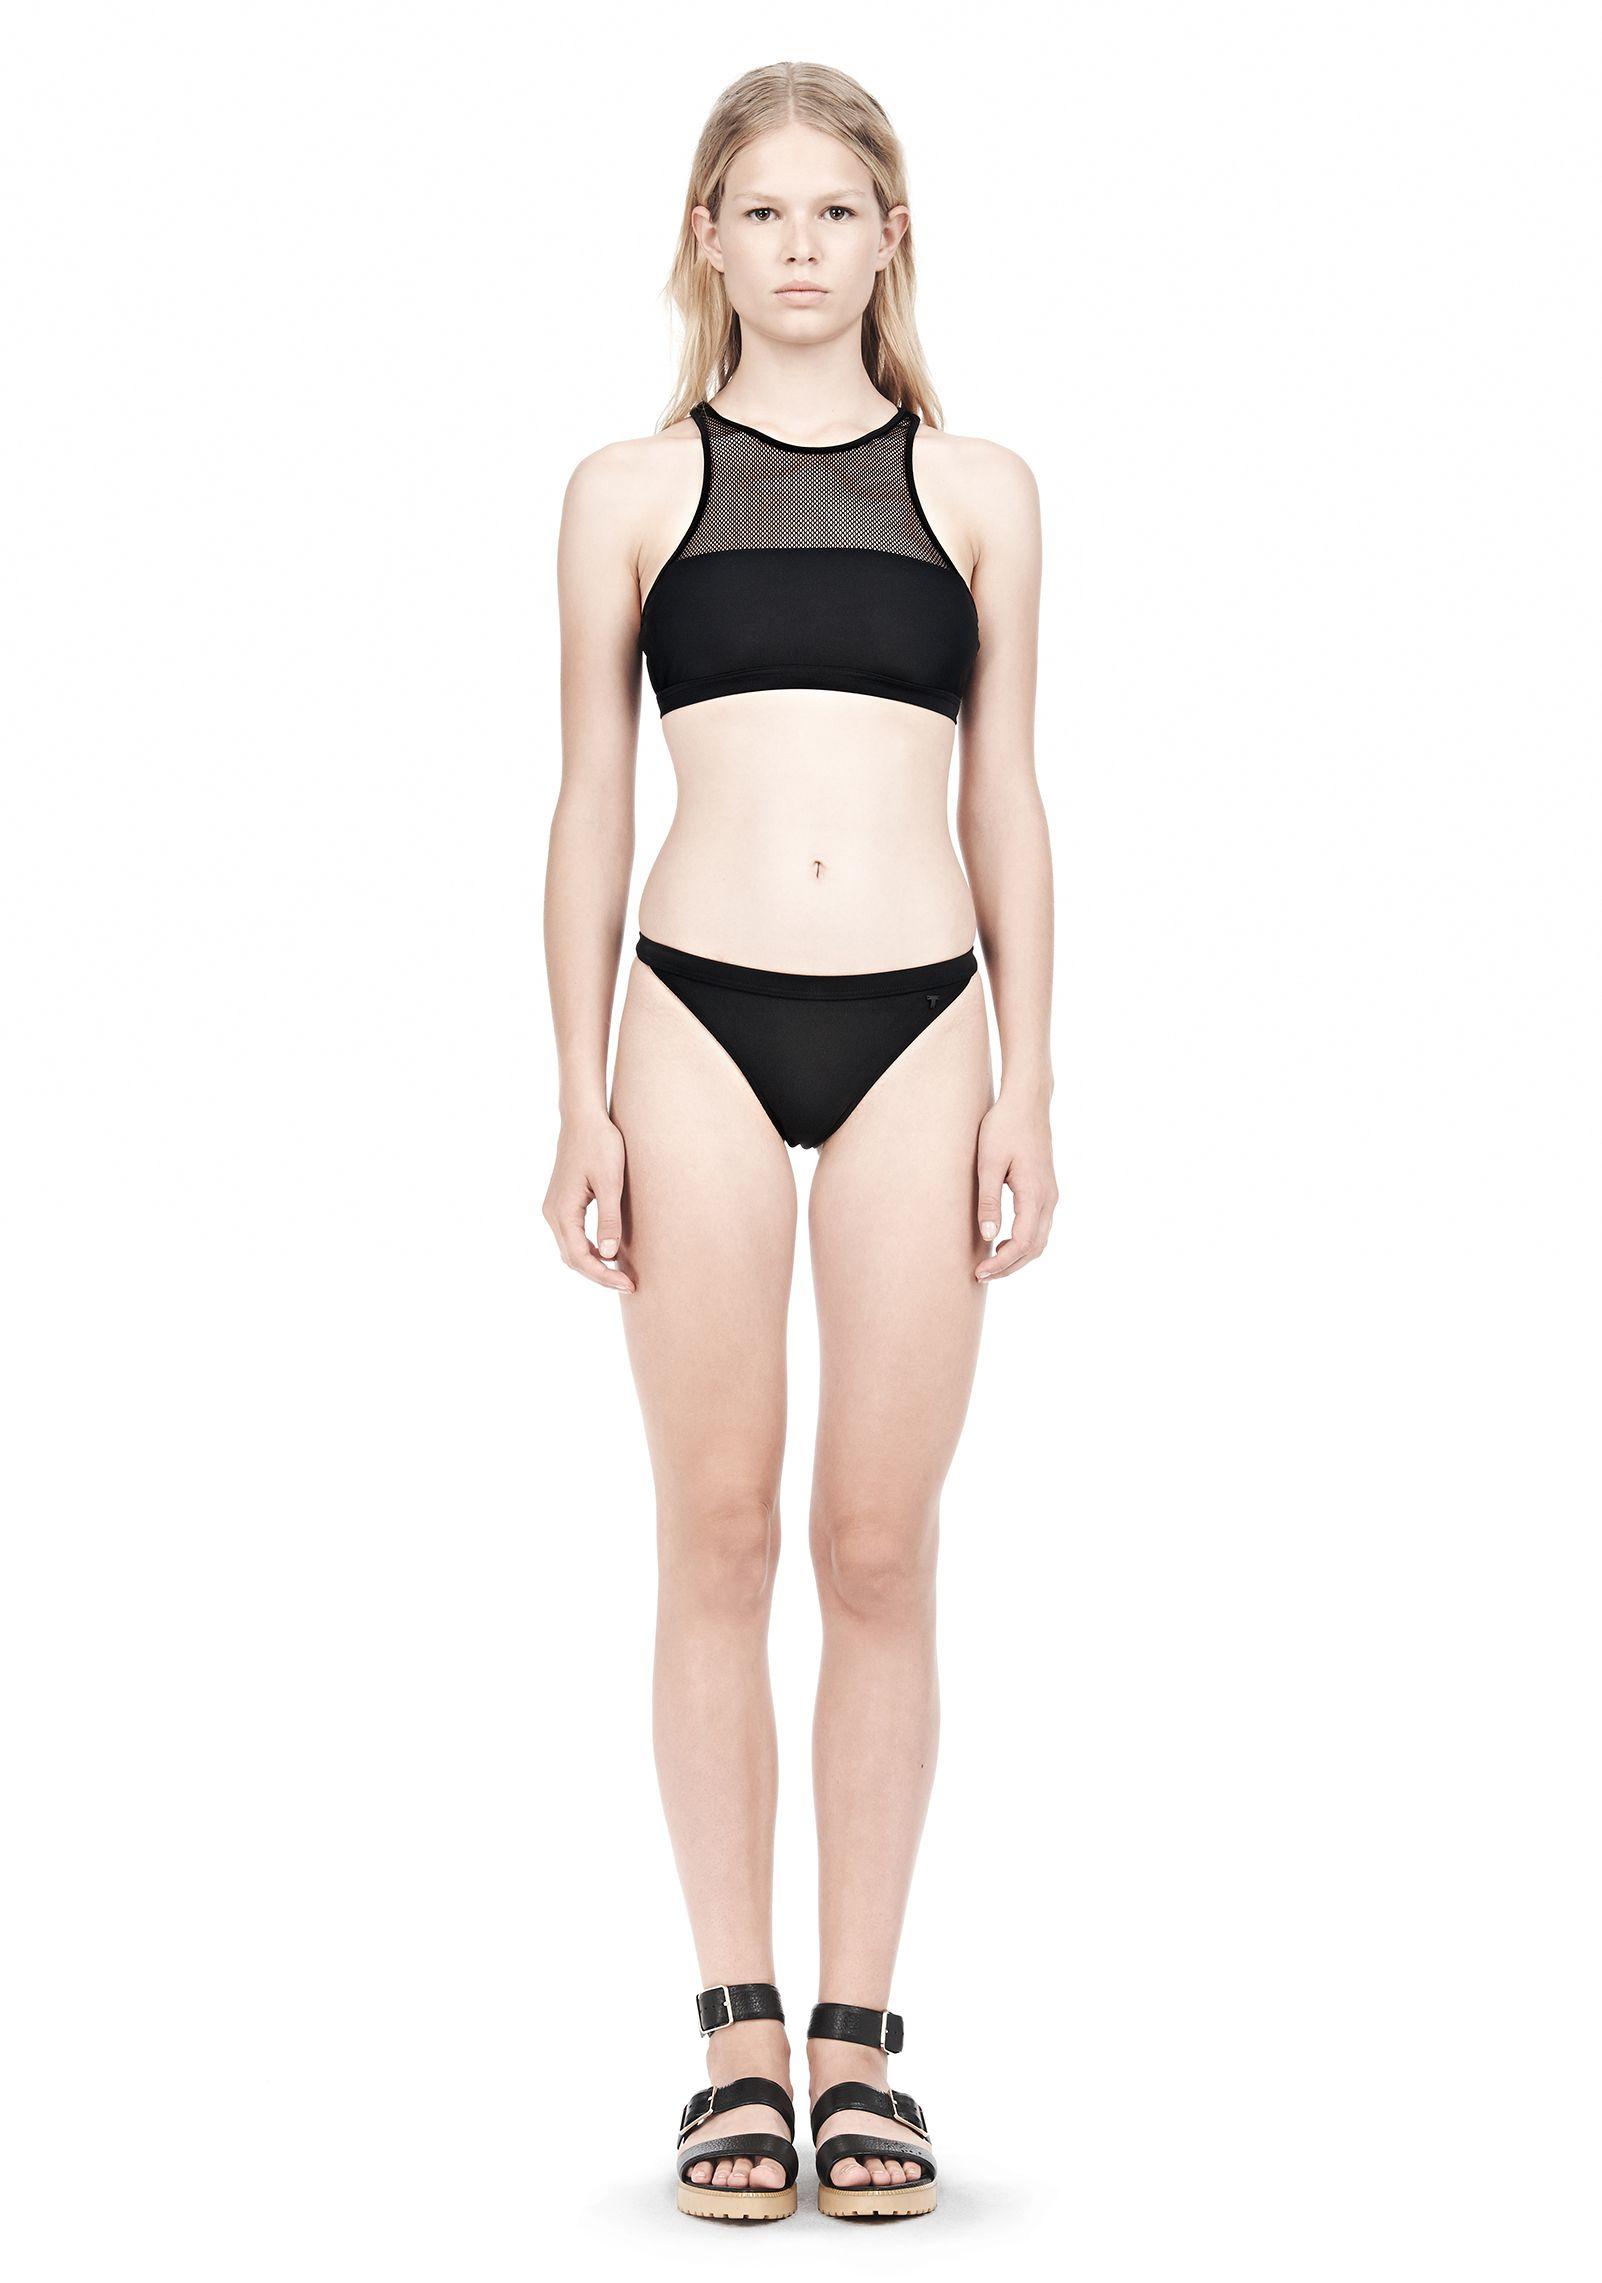 MESH COMBO CREWNECK RACERBACK SWIM TOP - Beachwear Women - Alexander Wang Online Store